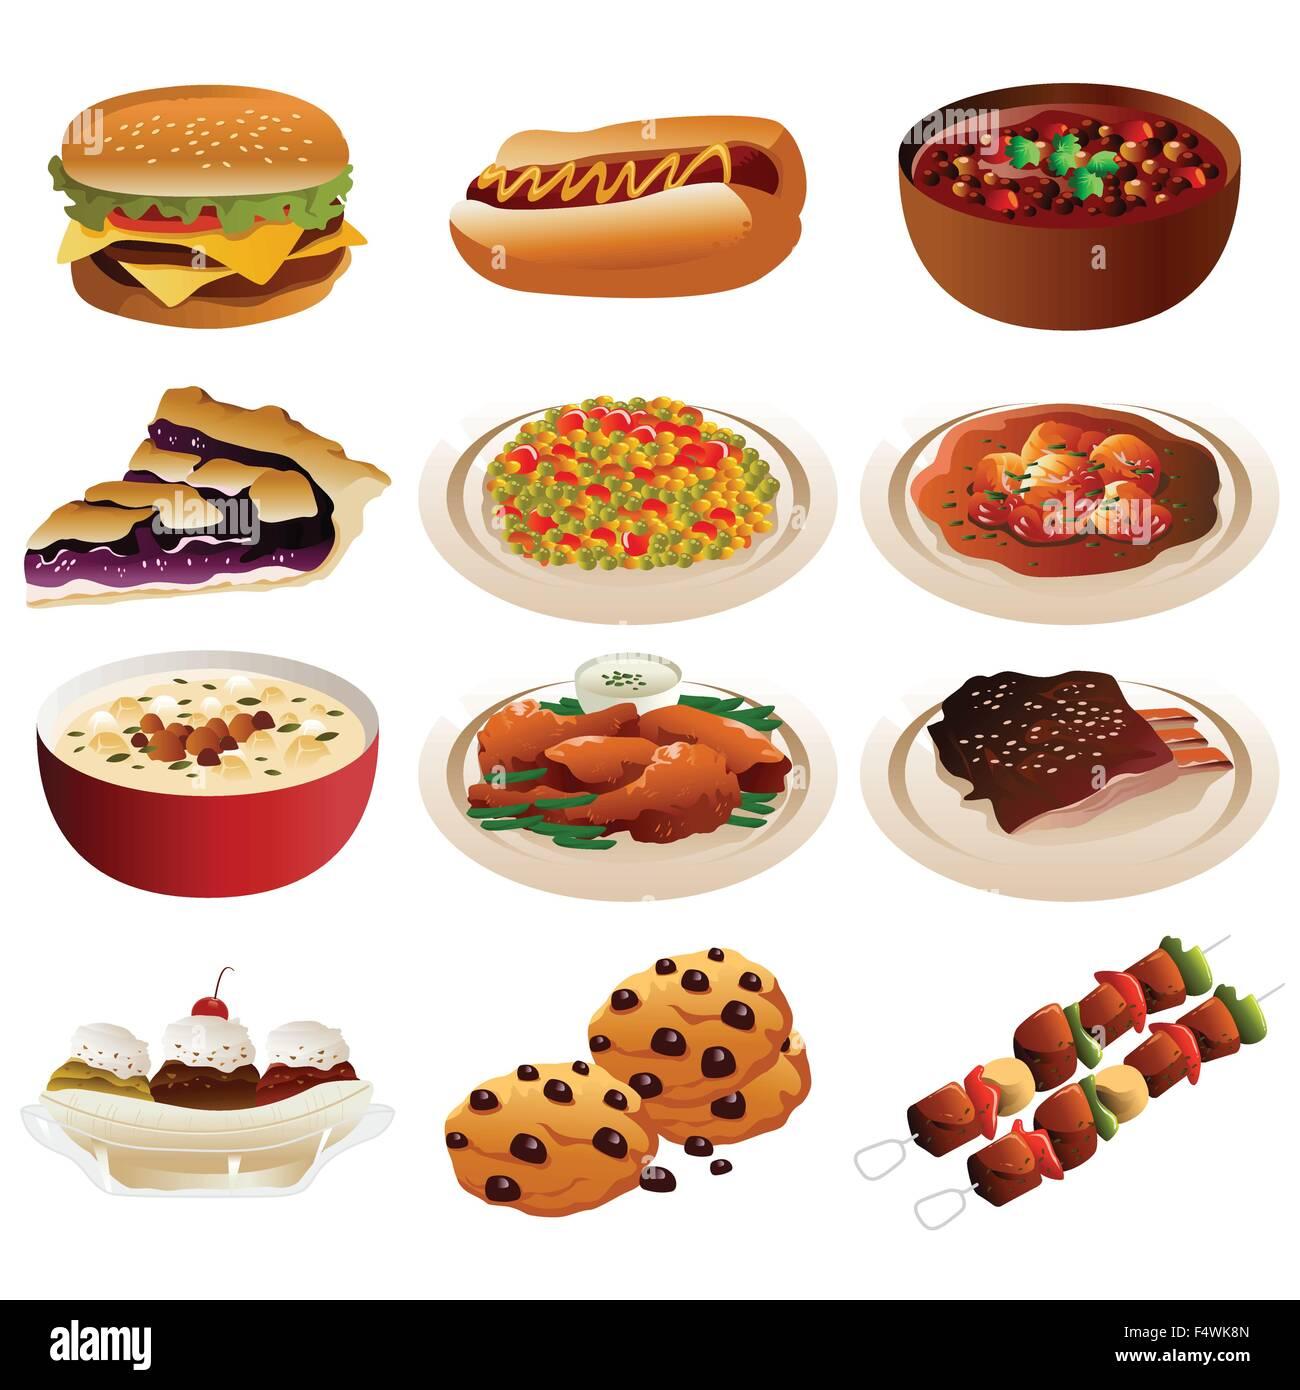 eine vektor illustration von american food icons vektor. Black Bedroom Furniture Sets. Home Design Ideas